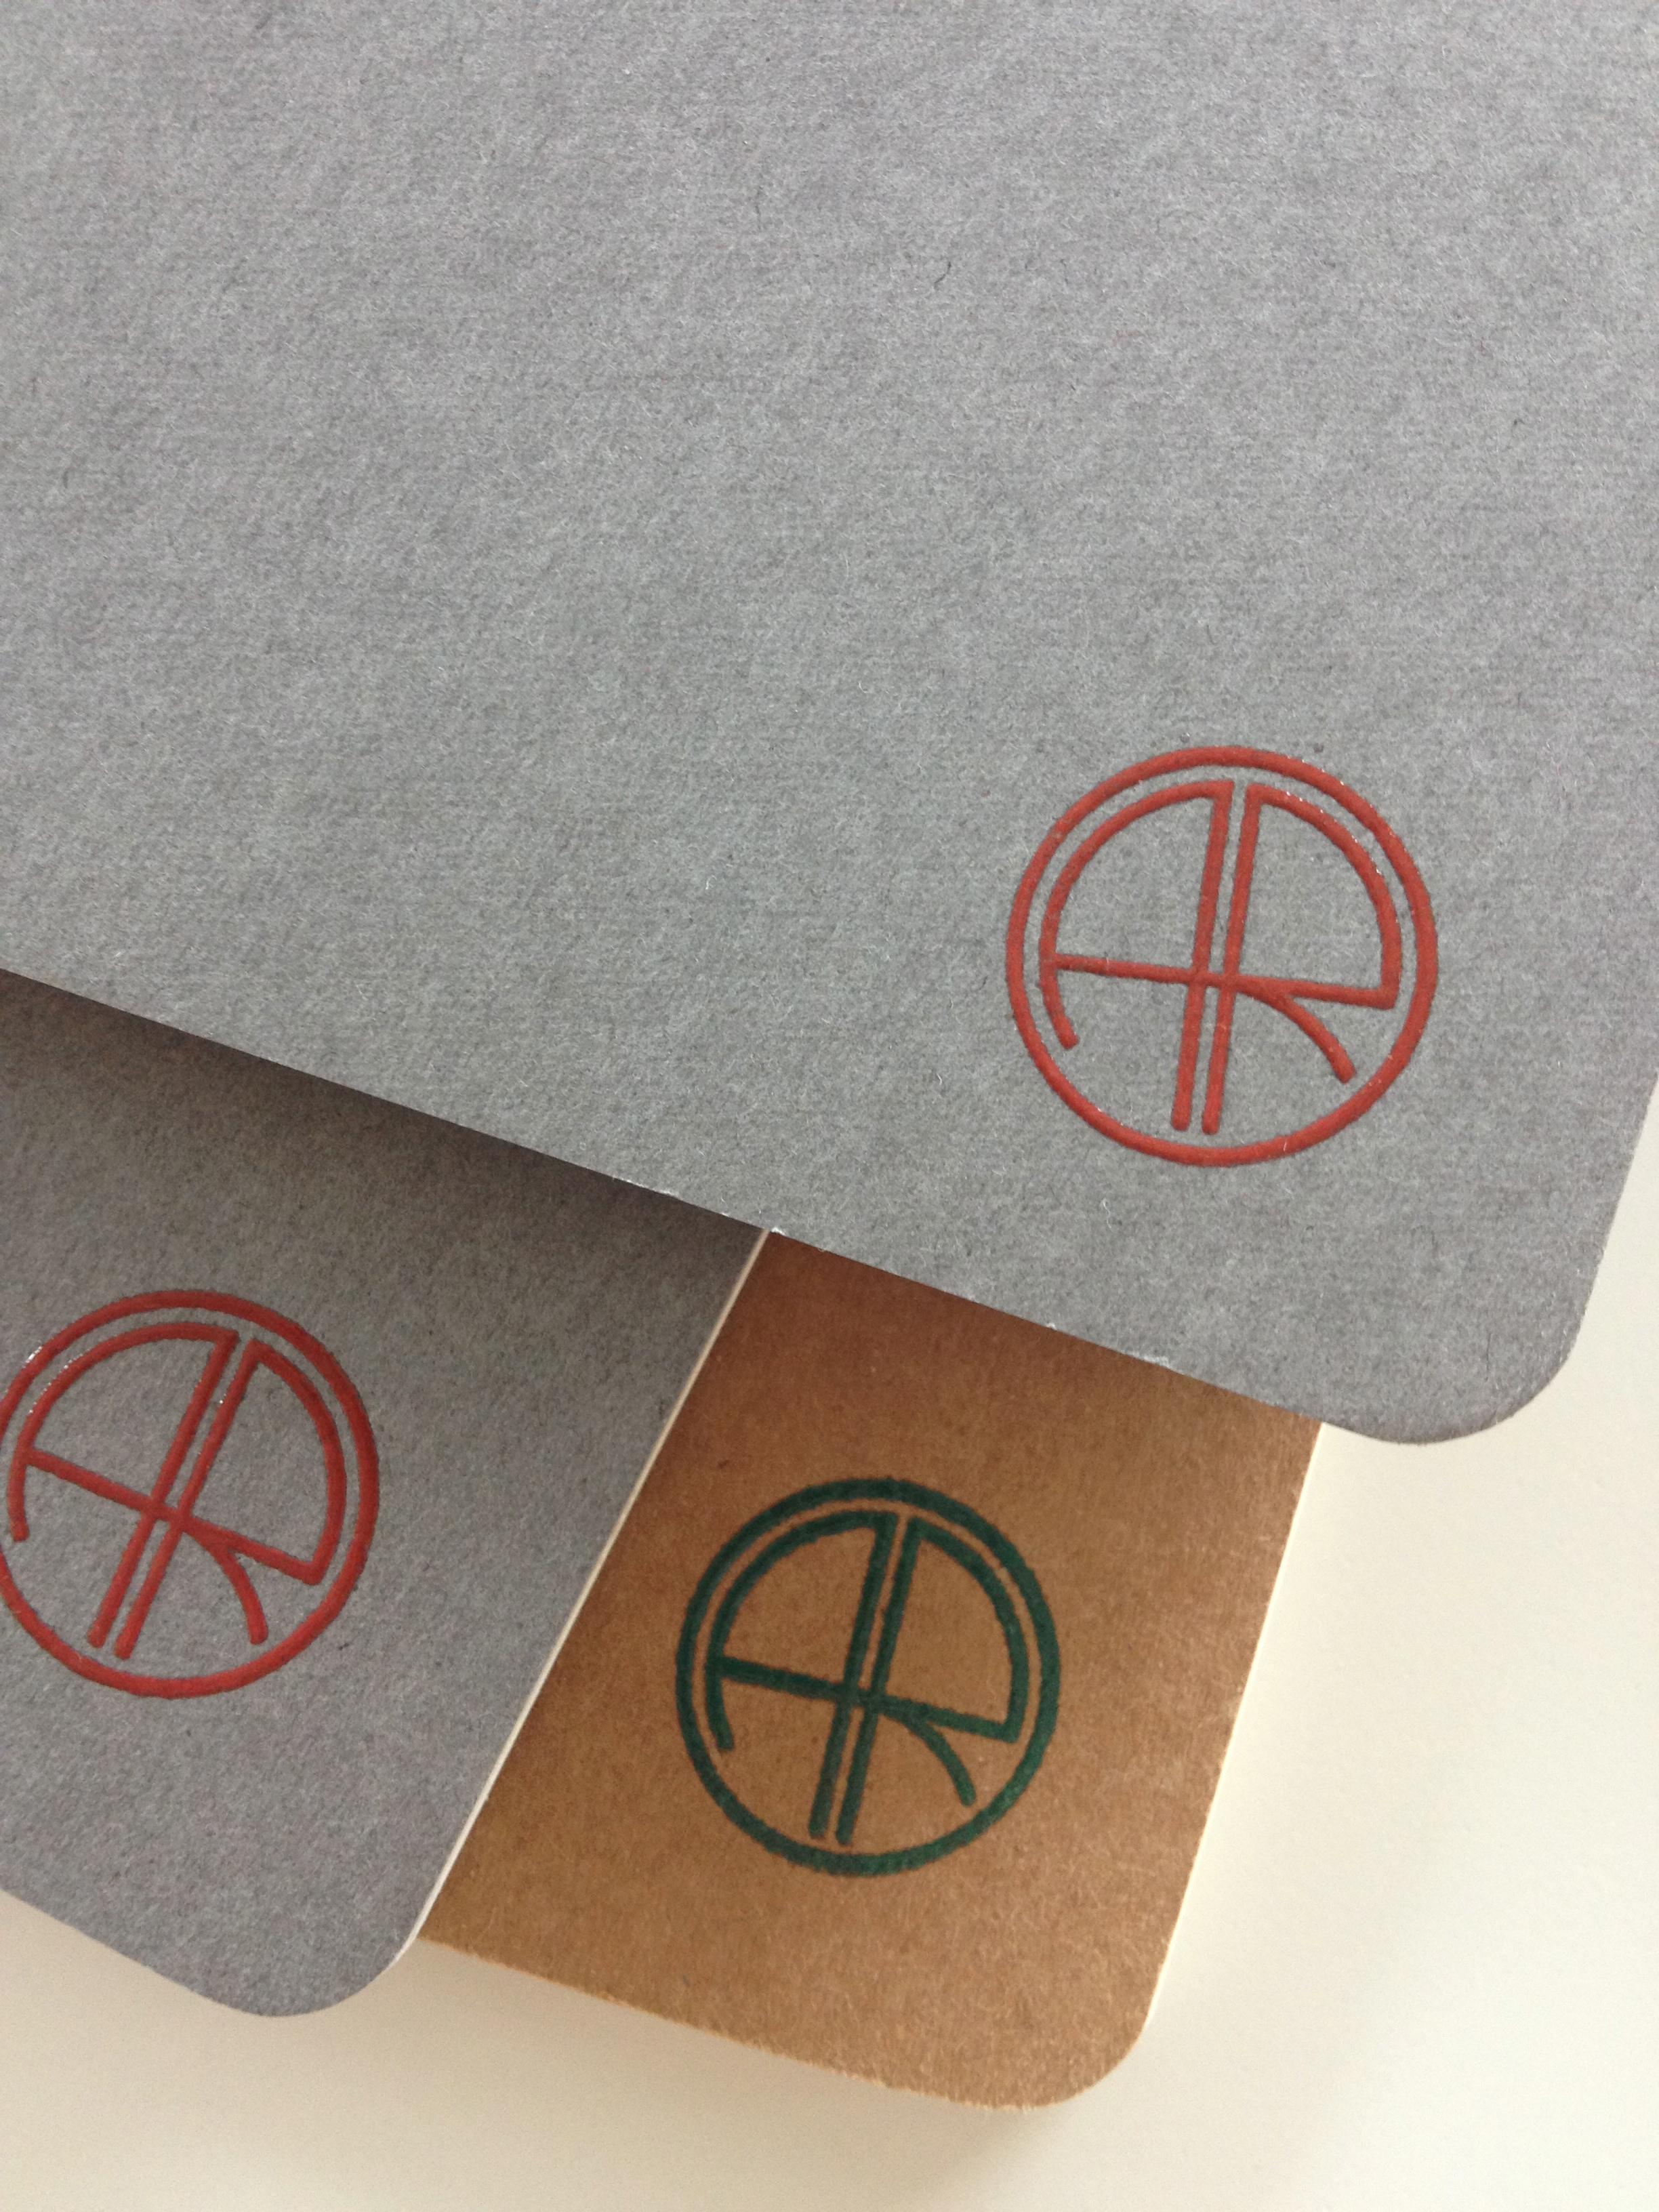 AR Stamp